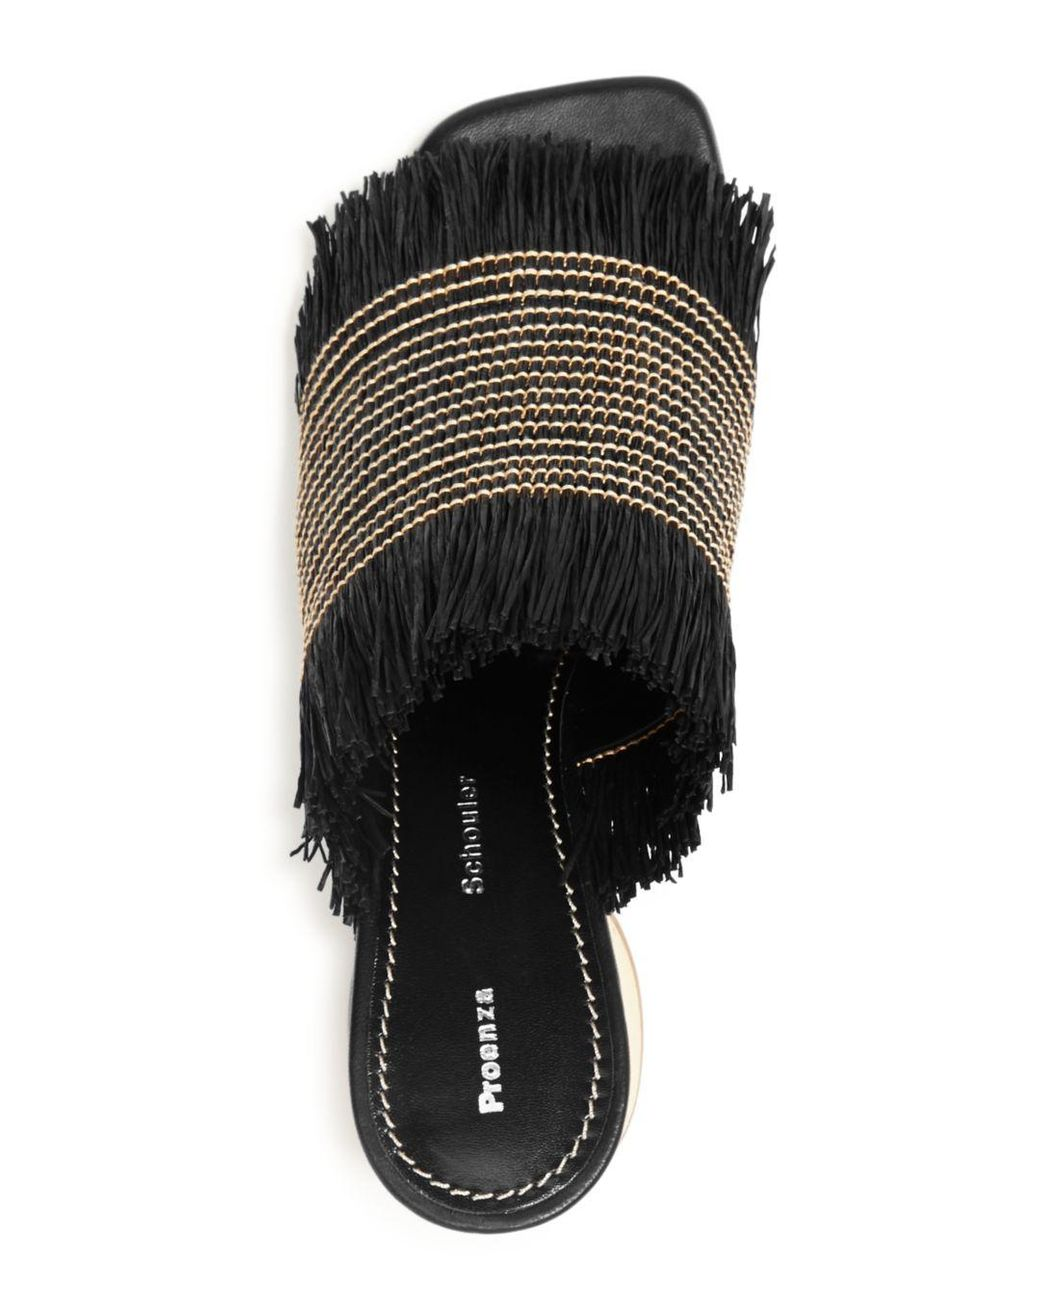 Schutz Endy Desert Brown Woven Ankle Strap Retro Block Mid Heel Sandal